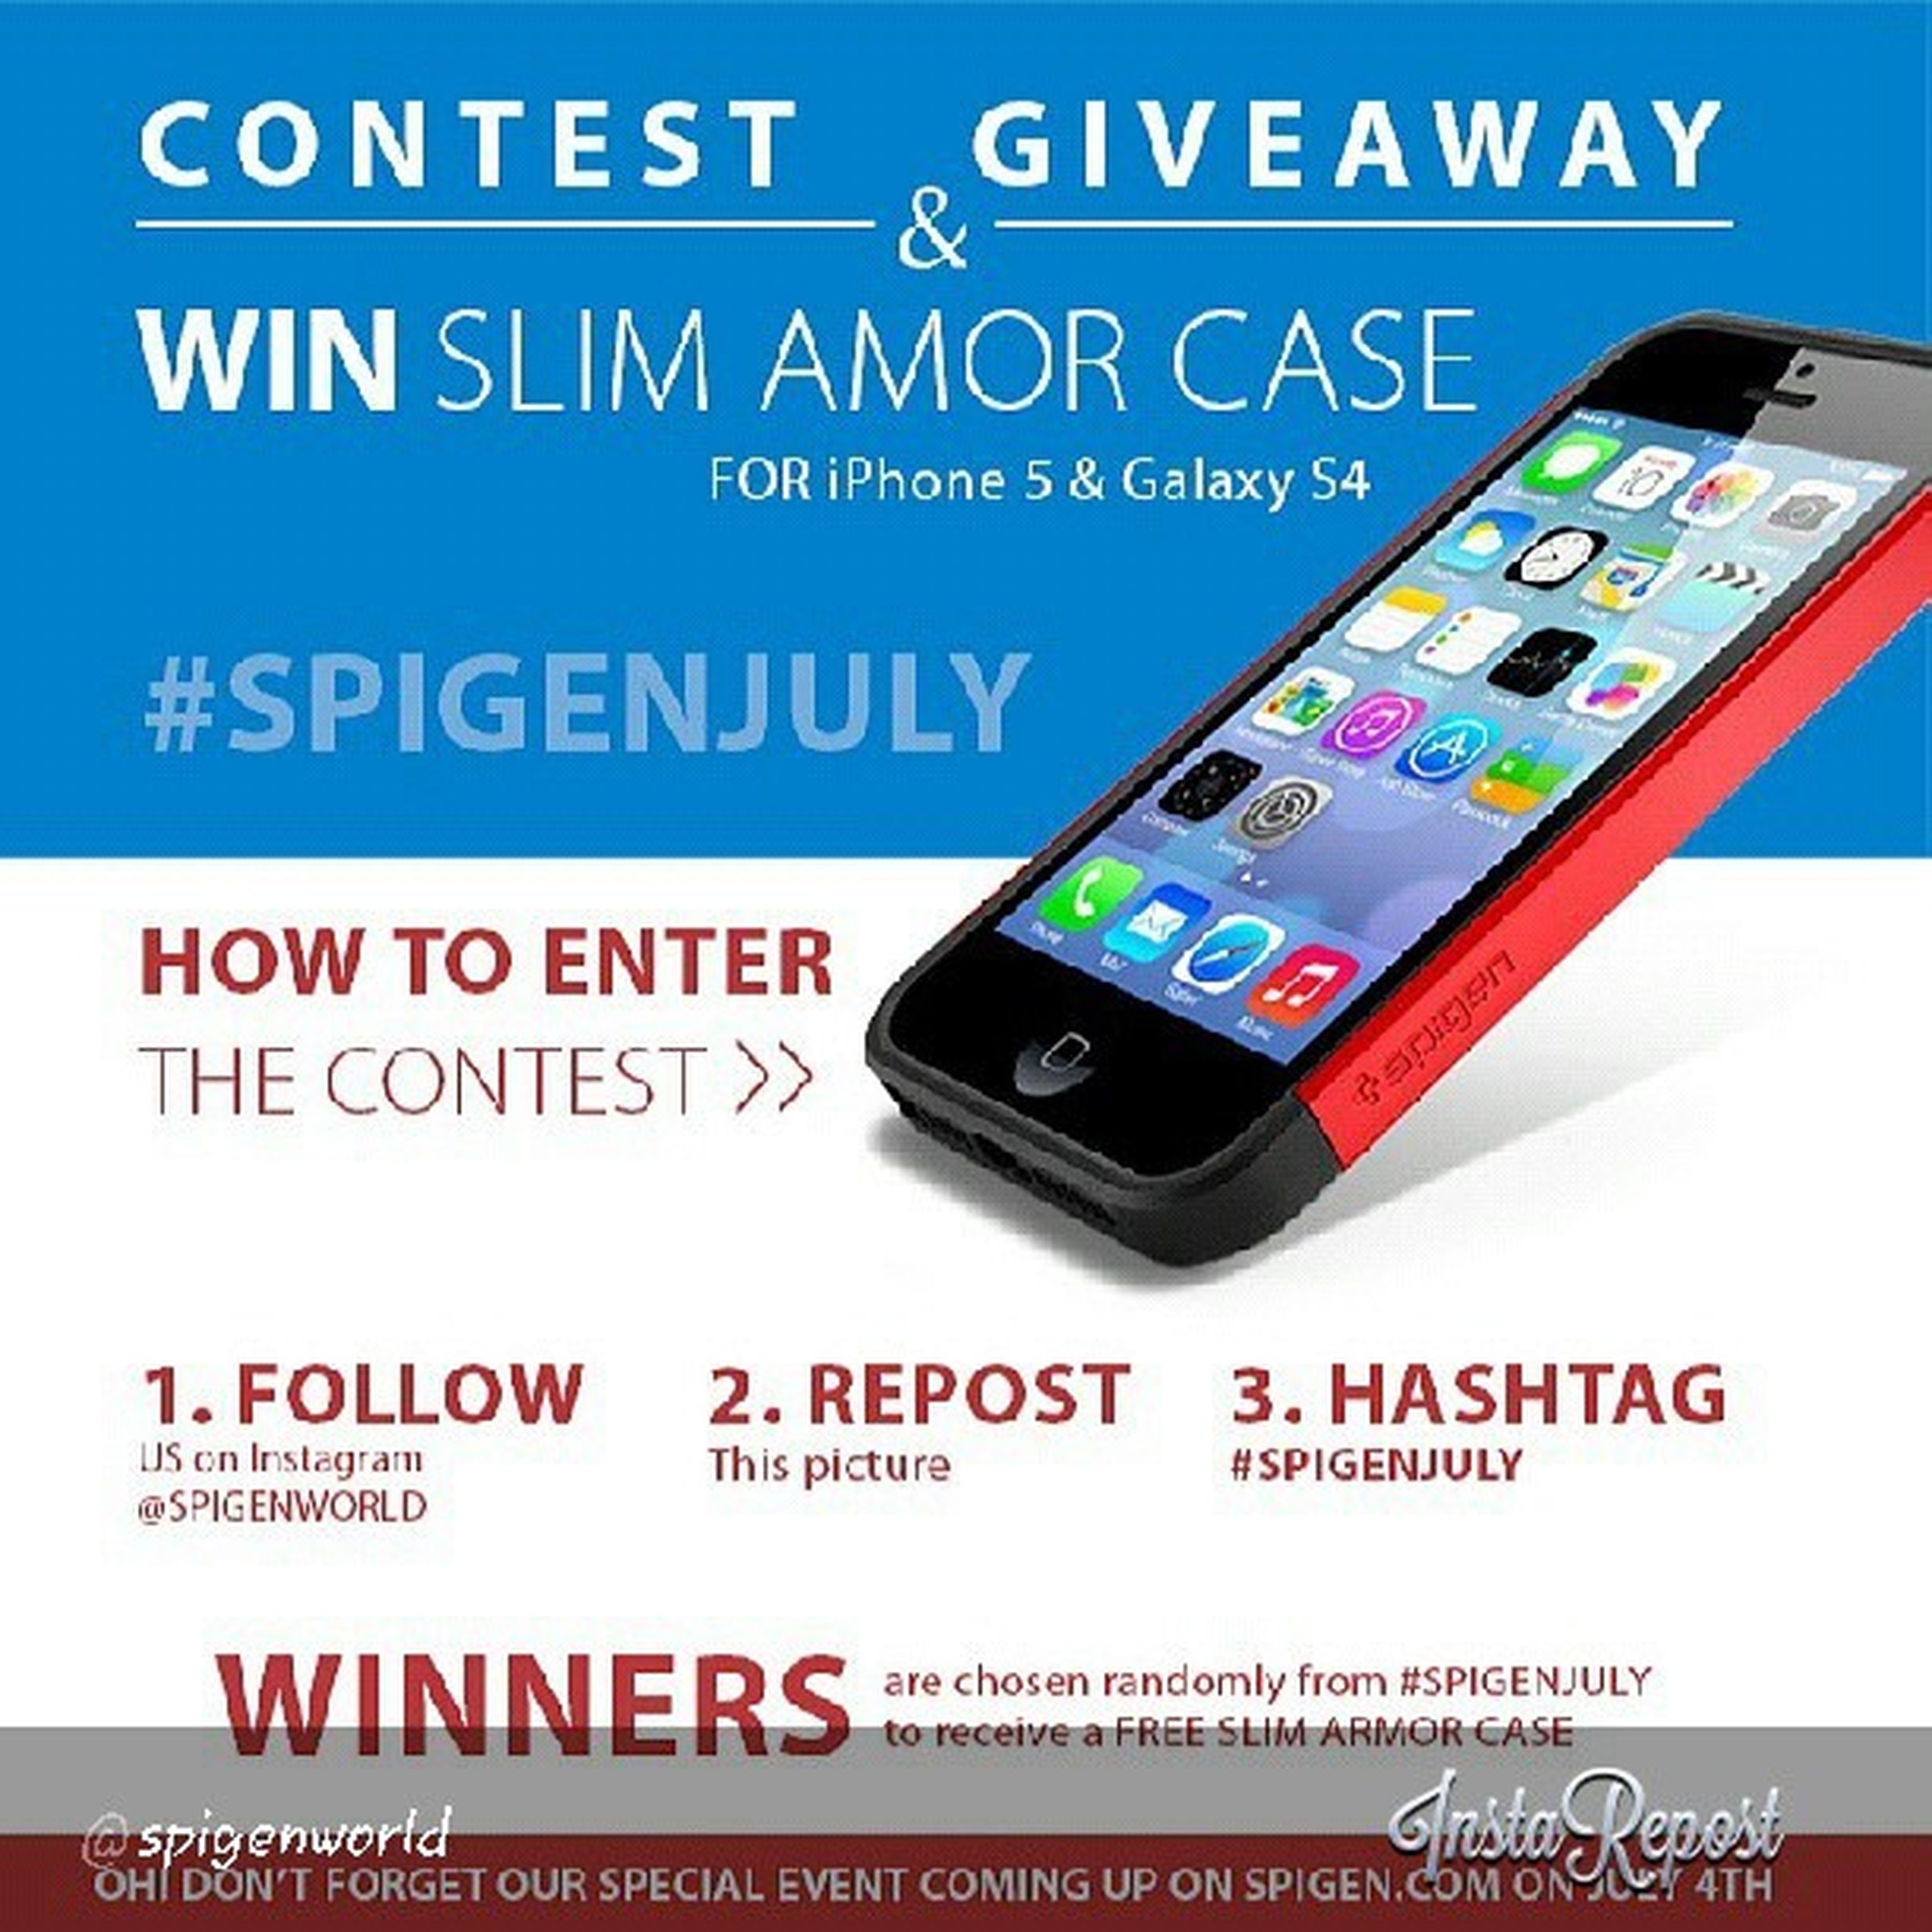 I want slim armor case Spigenjuly